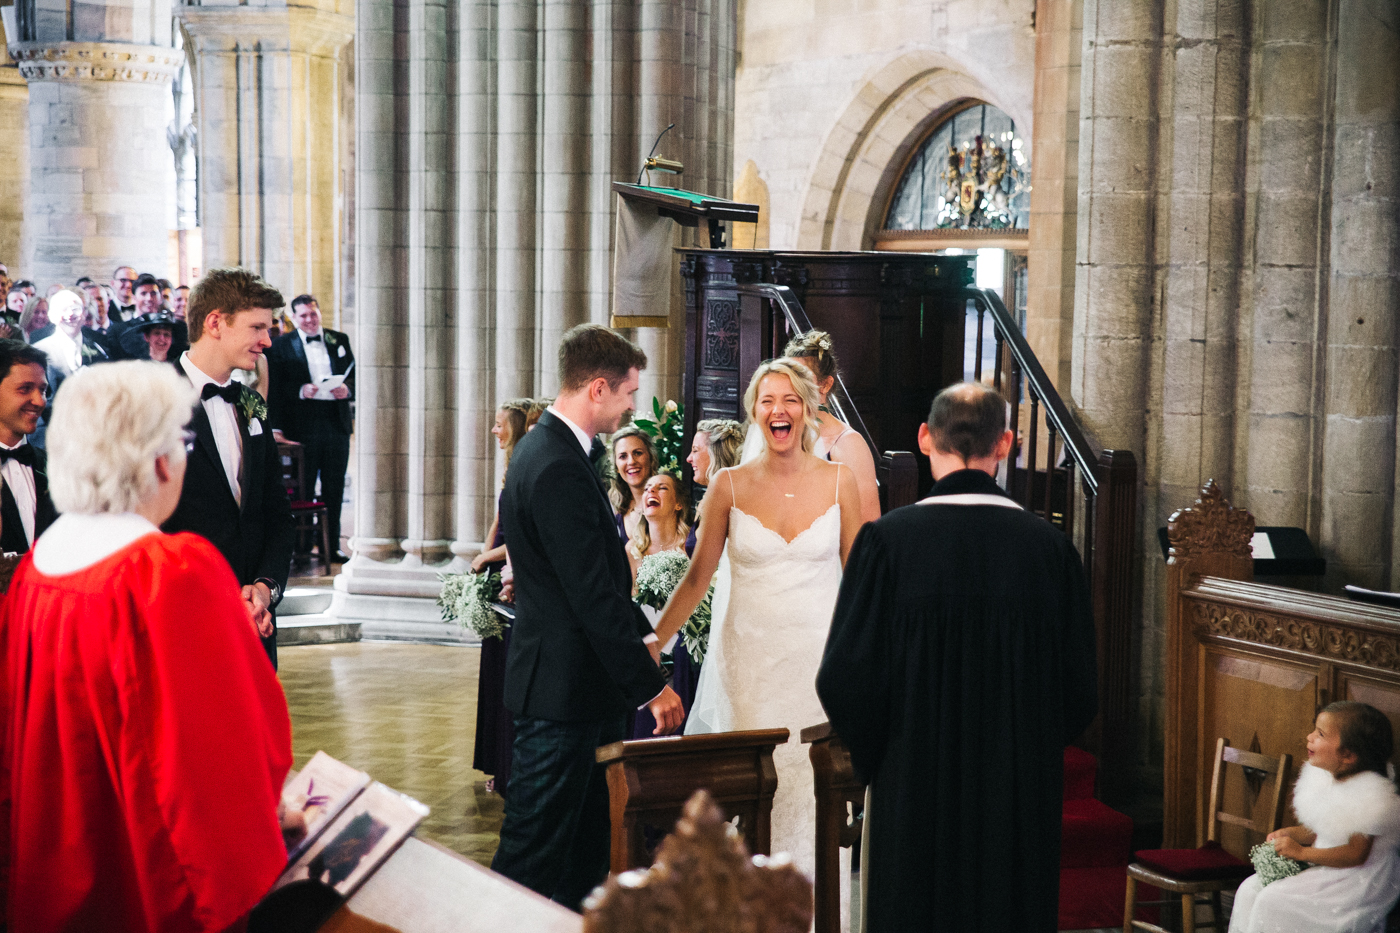 teesside-middlesbrough-north-east-wedding-photographer-creative-wedding-venues-0002.jpg